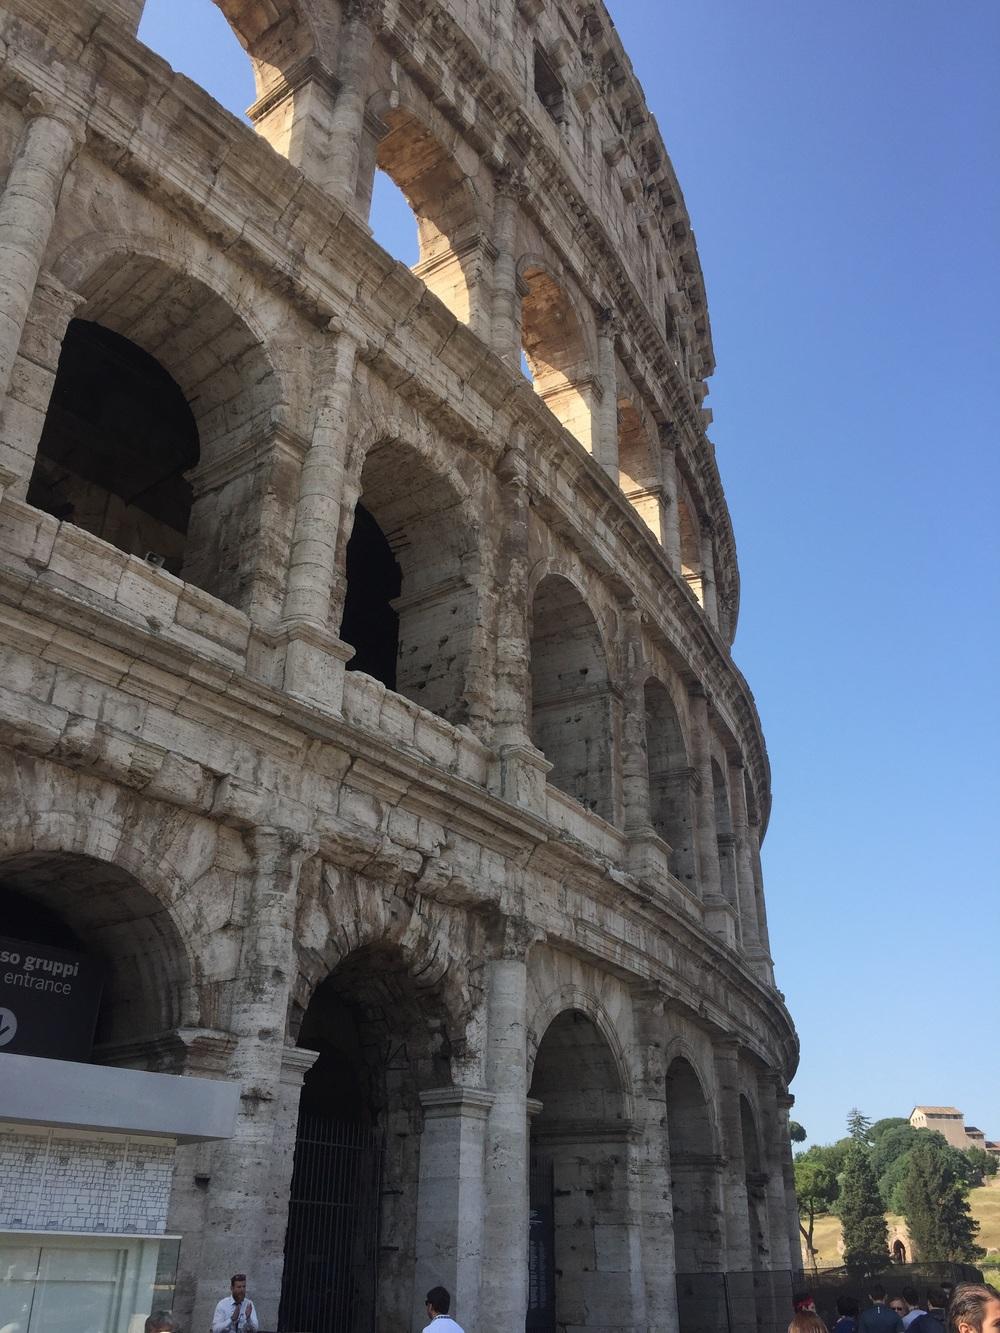 Colosseum aka Flavian Amphitheater